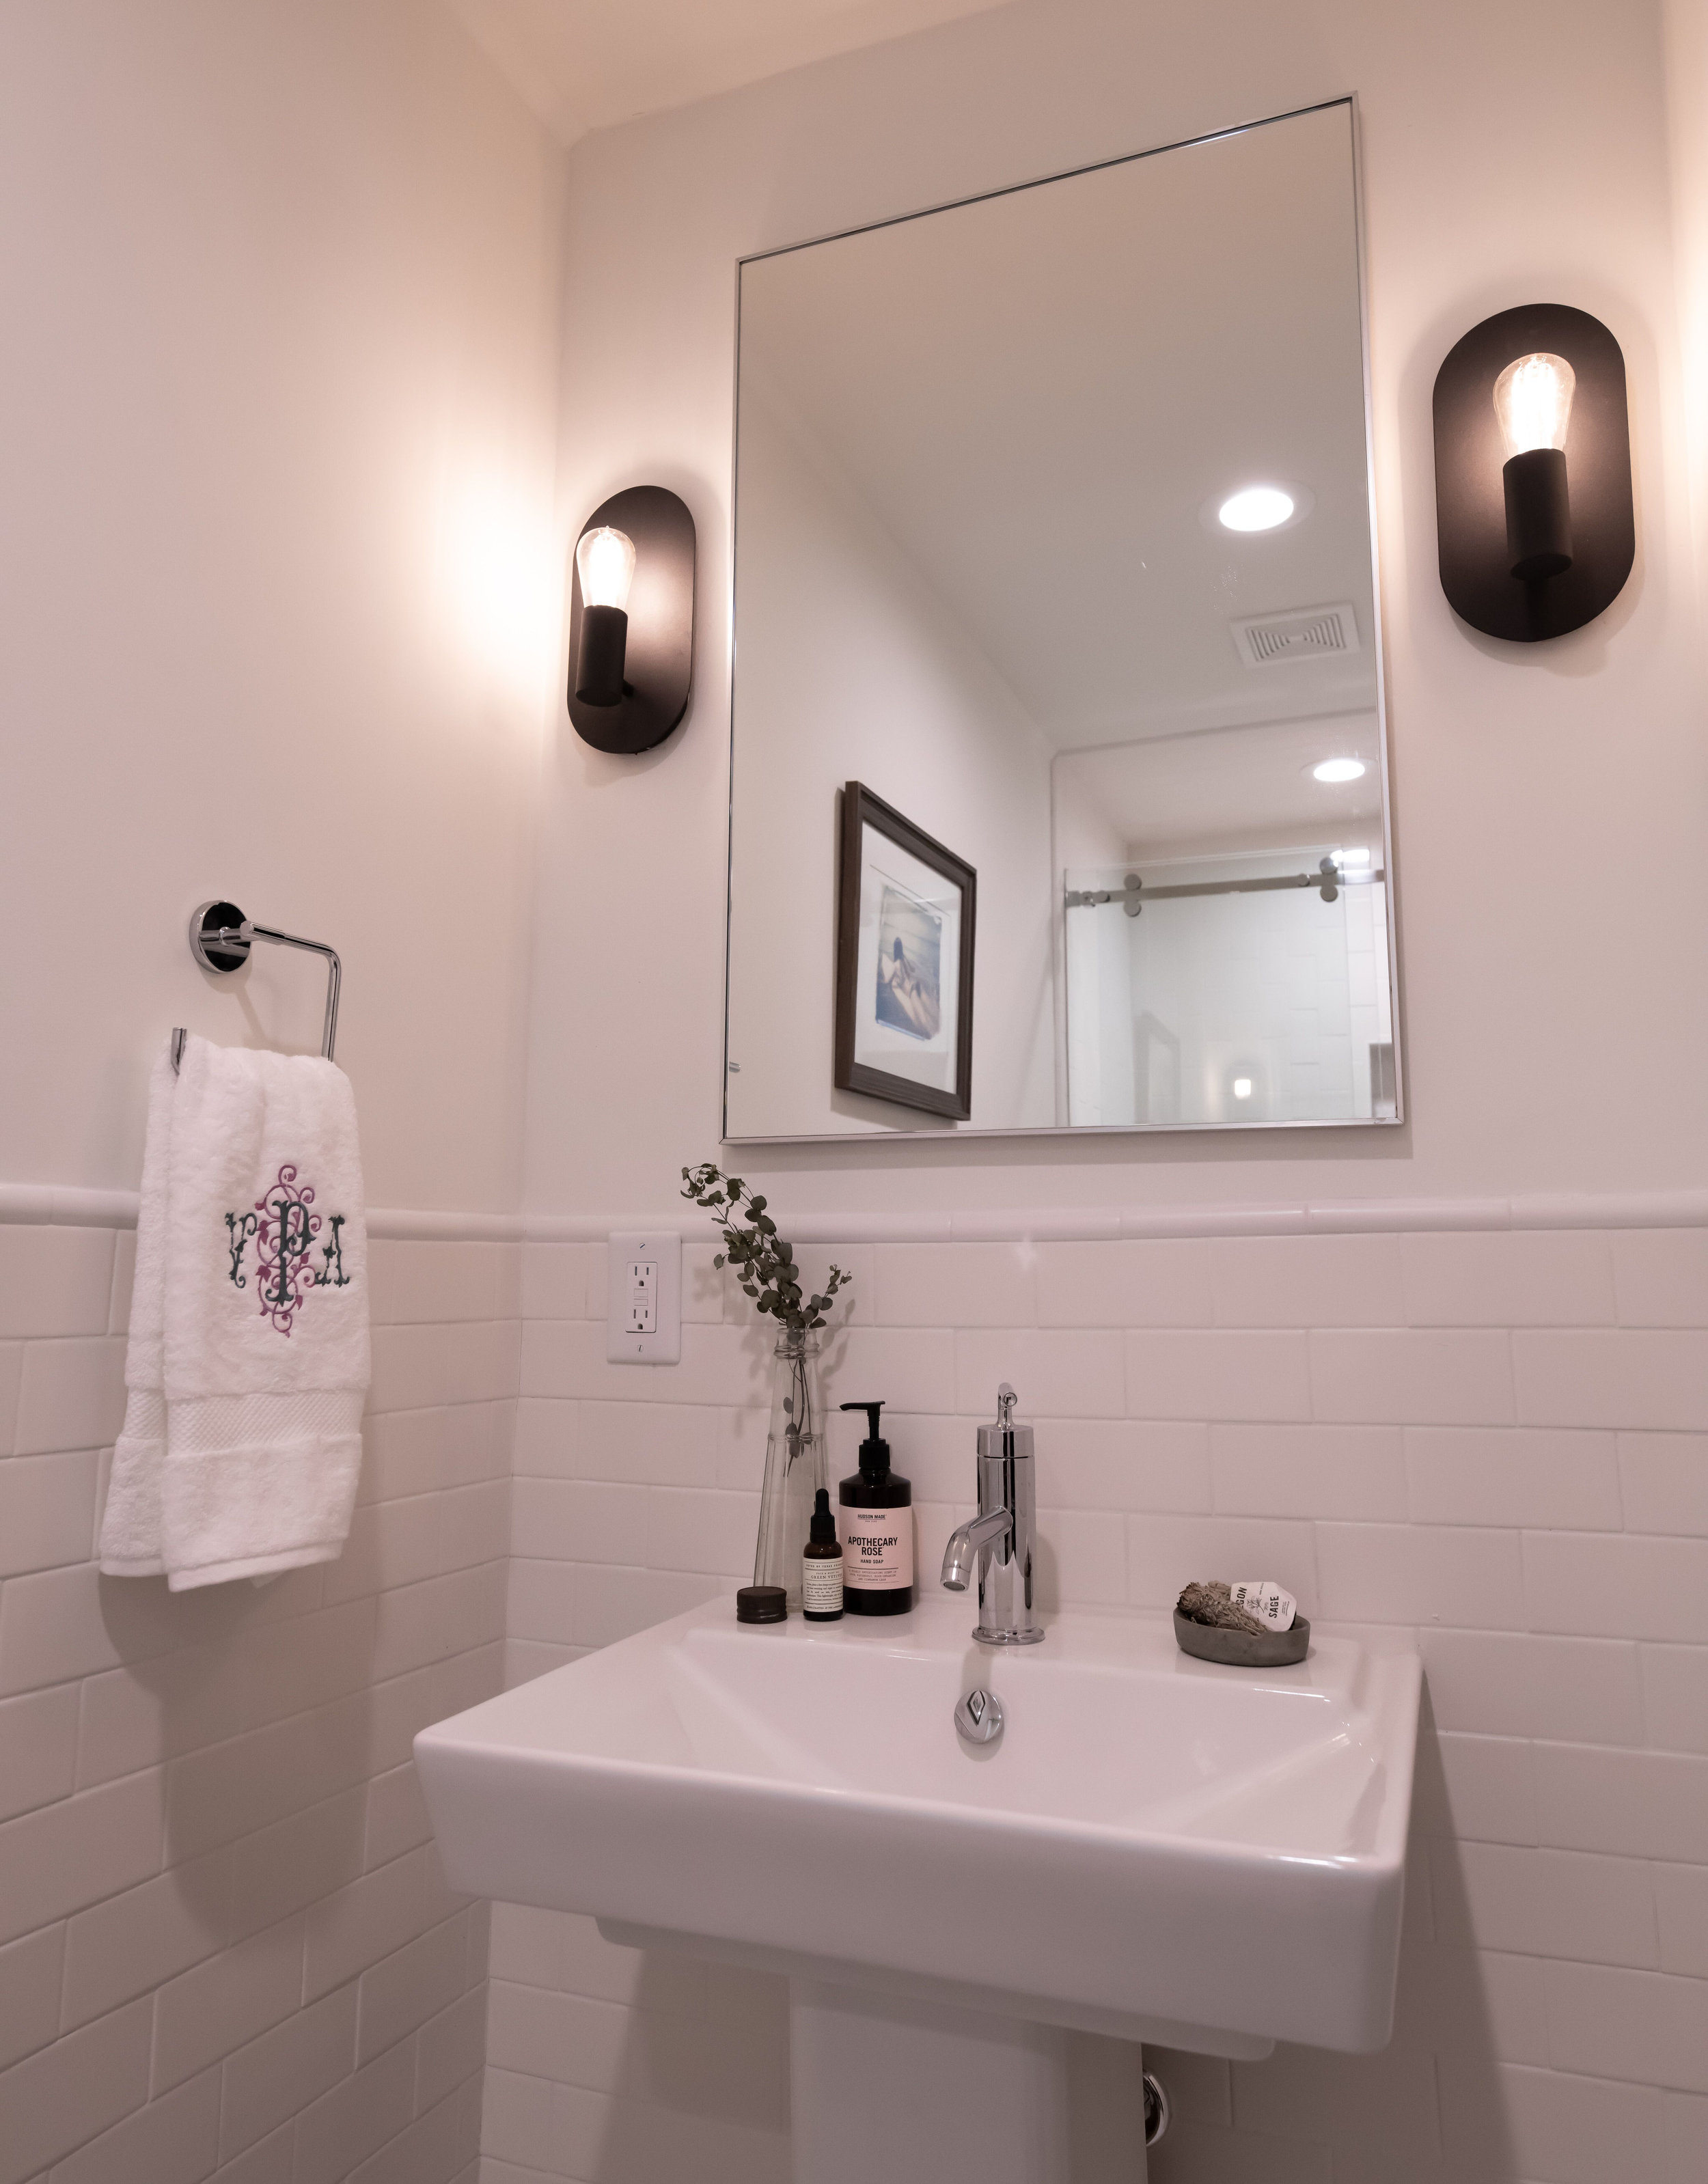 huntersbathroom1.jpg